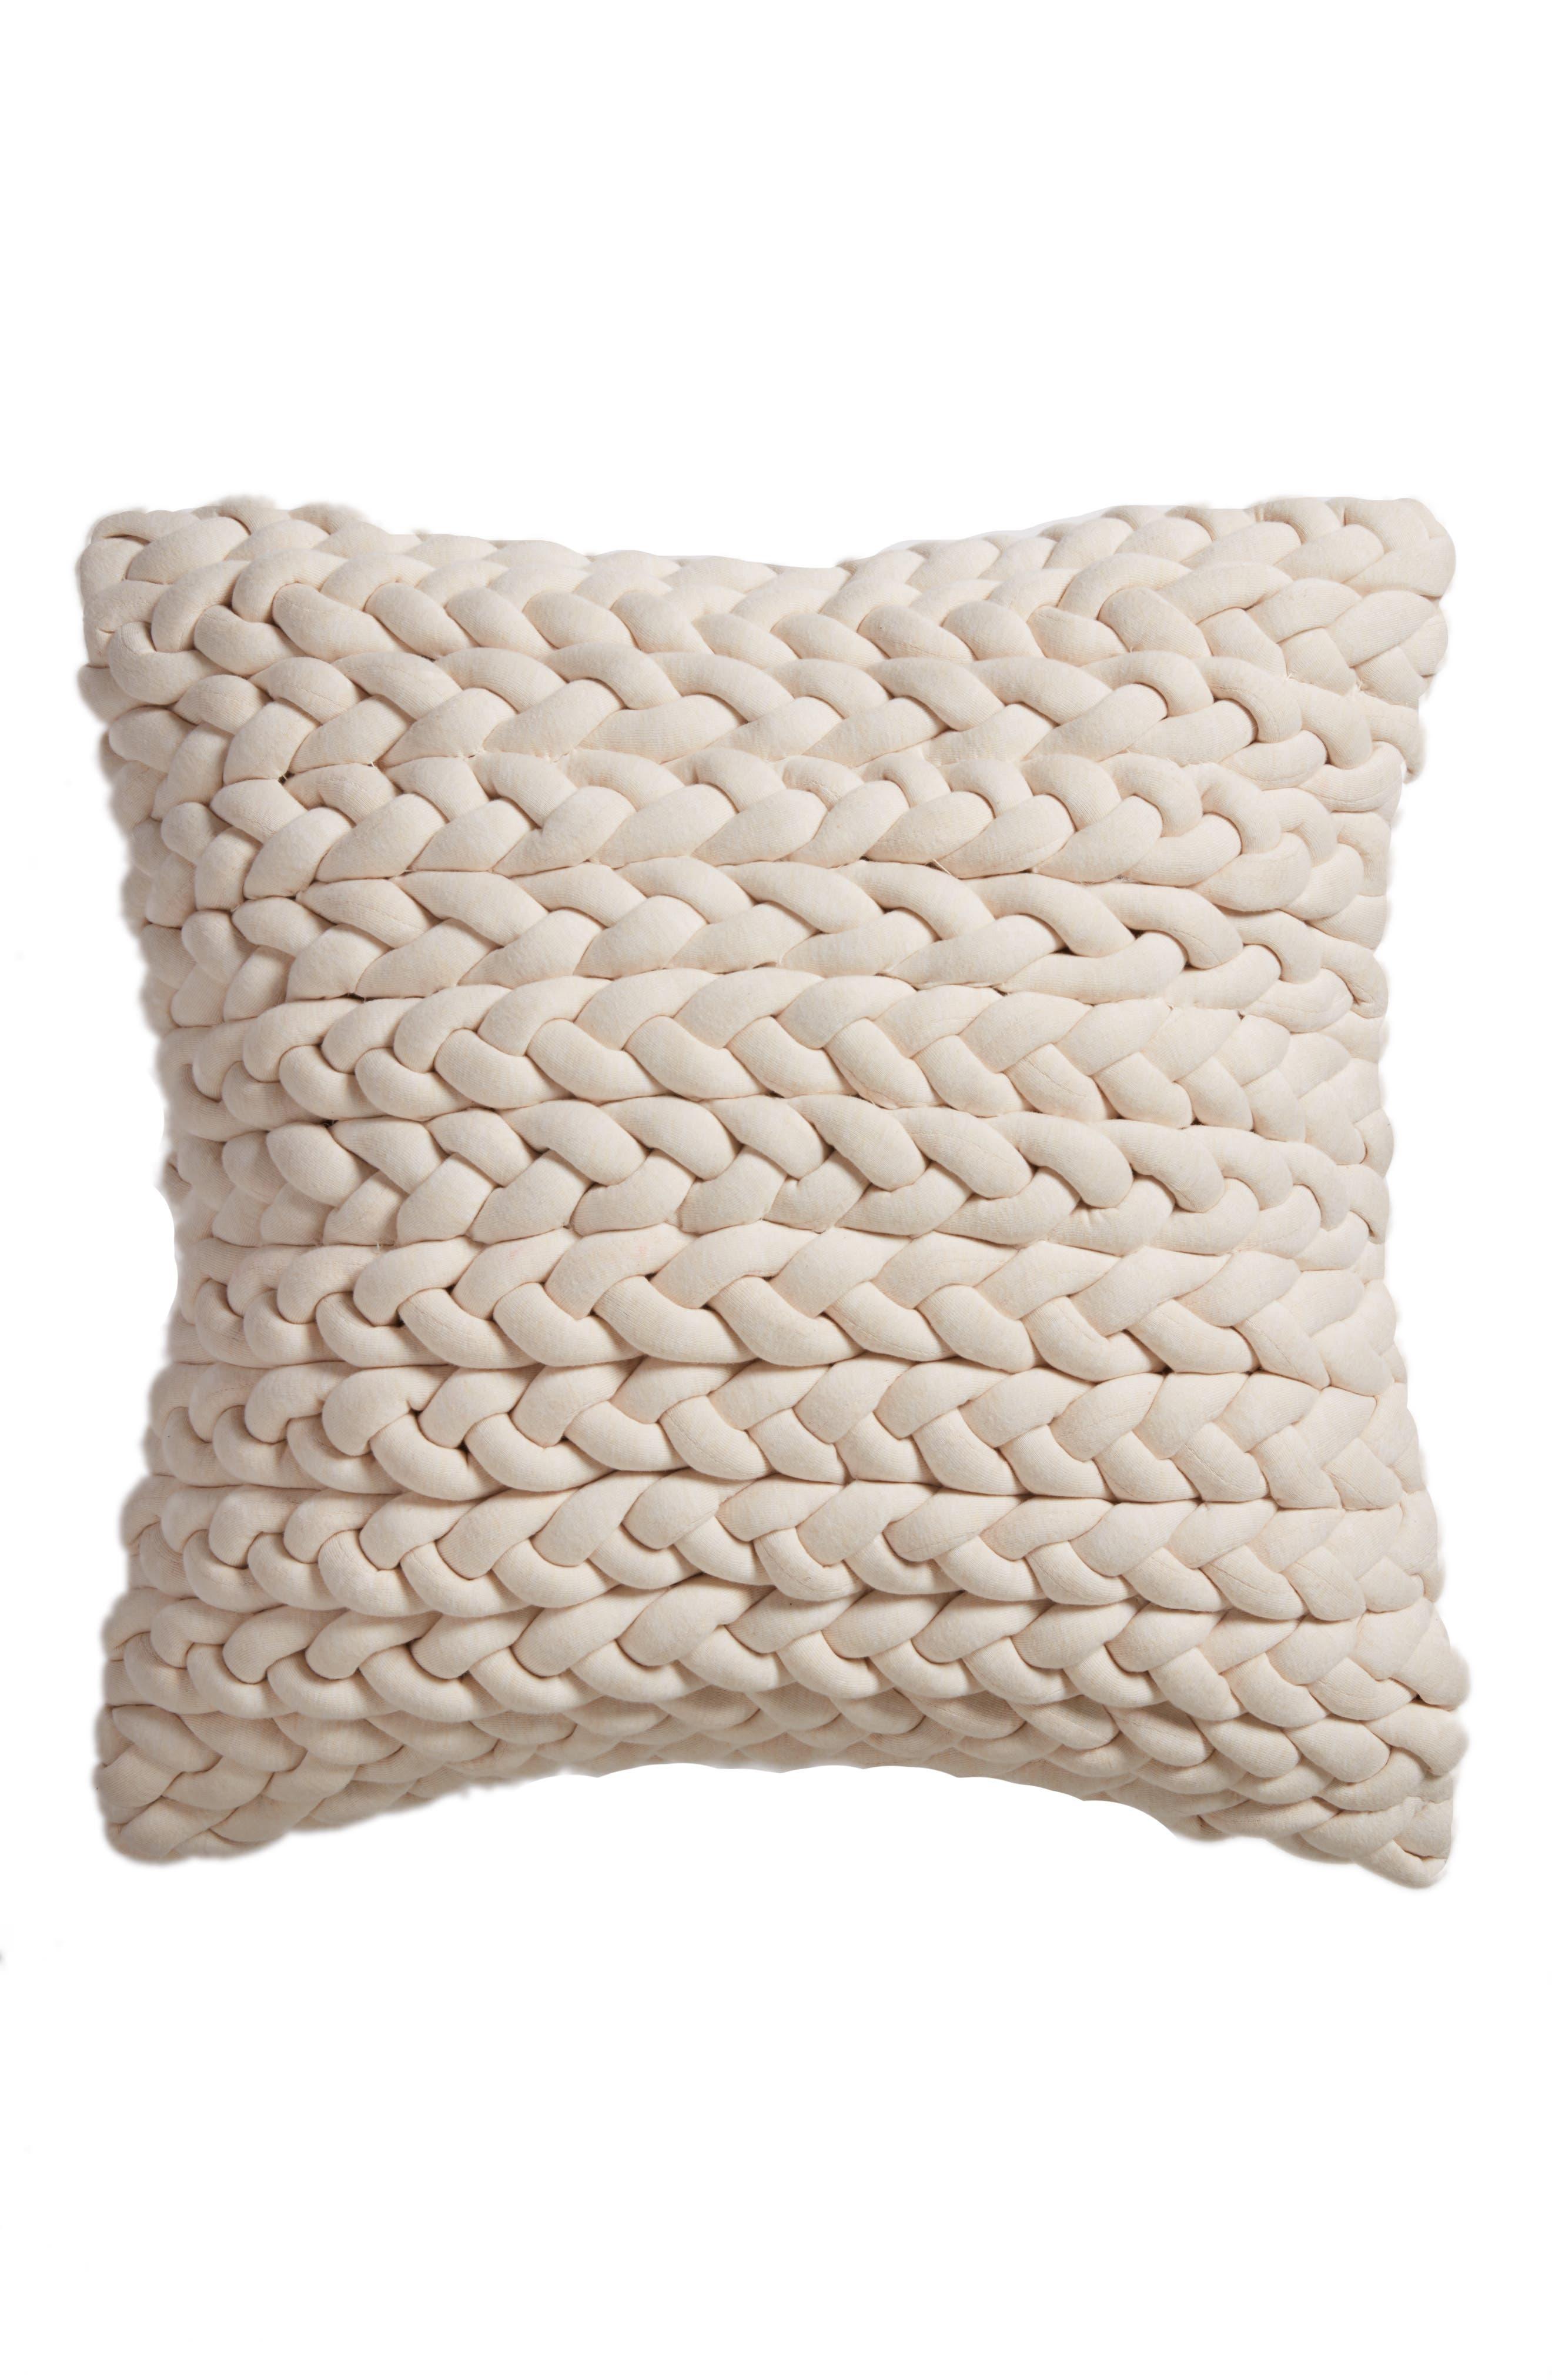 Jersey Braid Accent Pillow,                             Main thumbnail 1, color,                             250